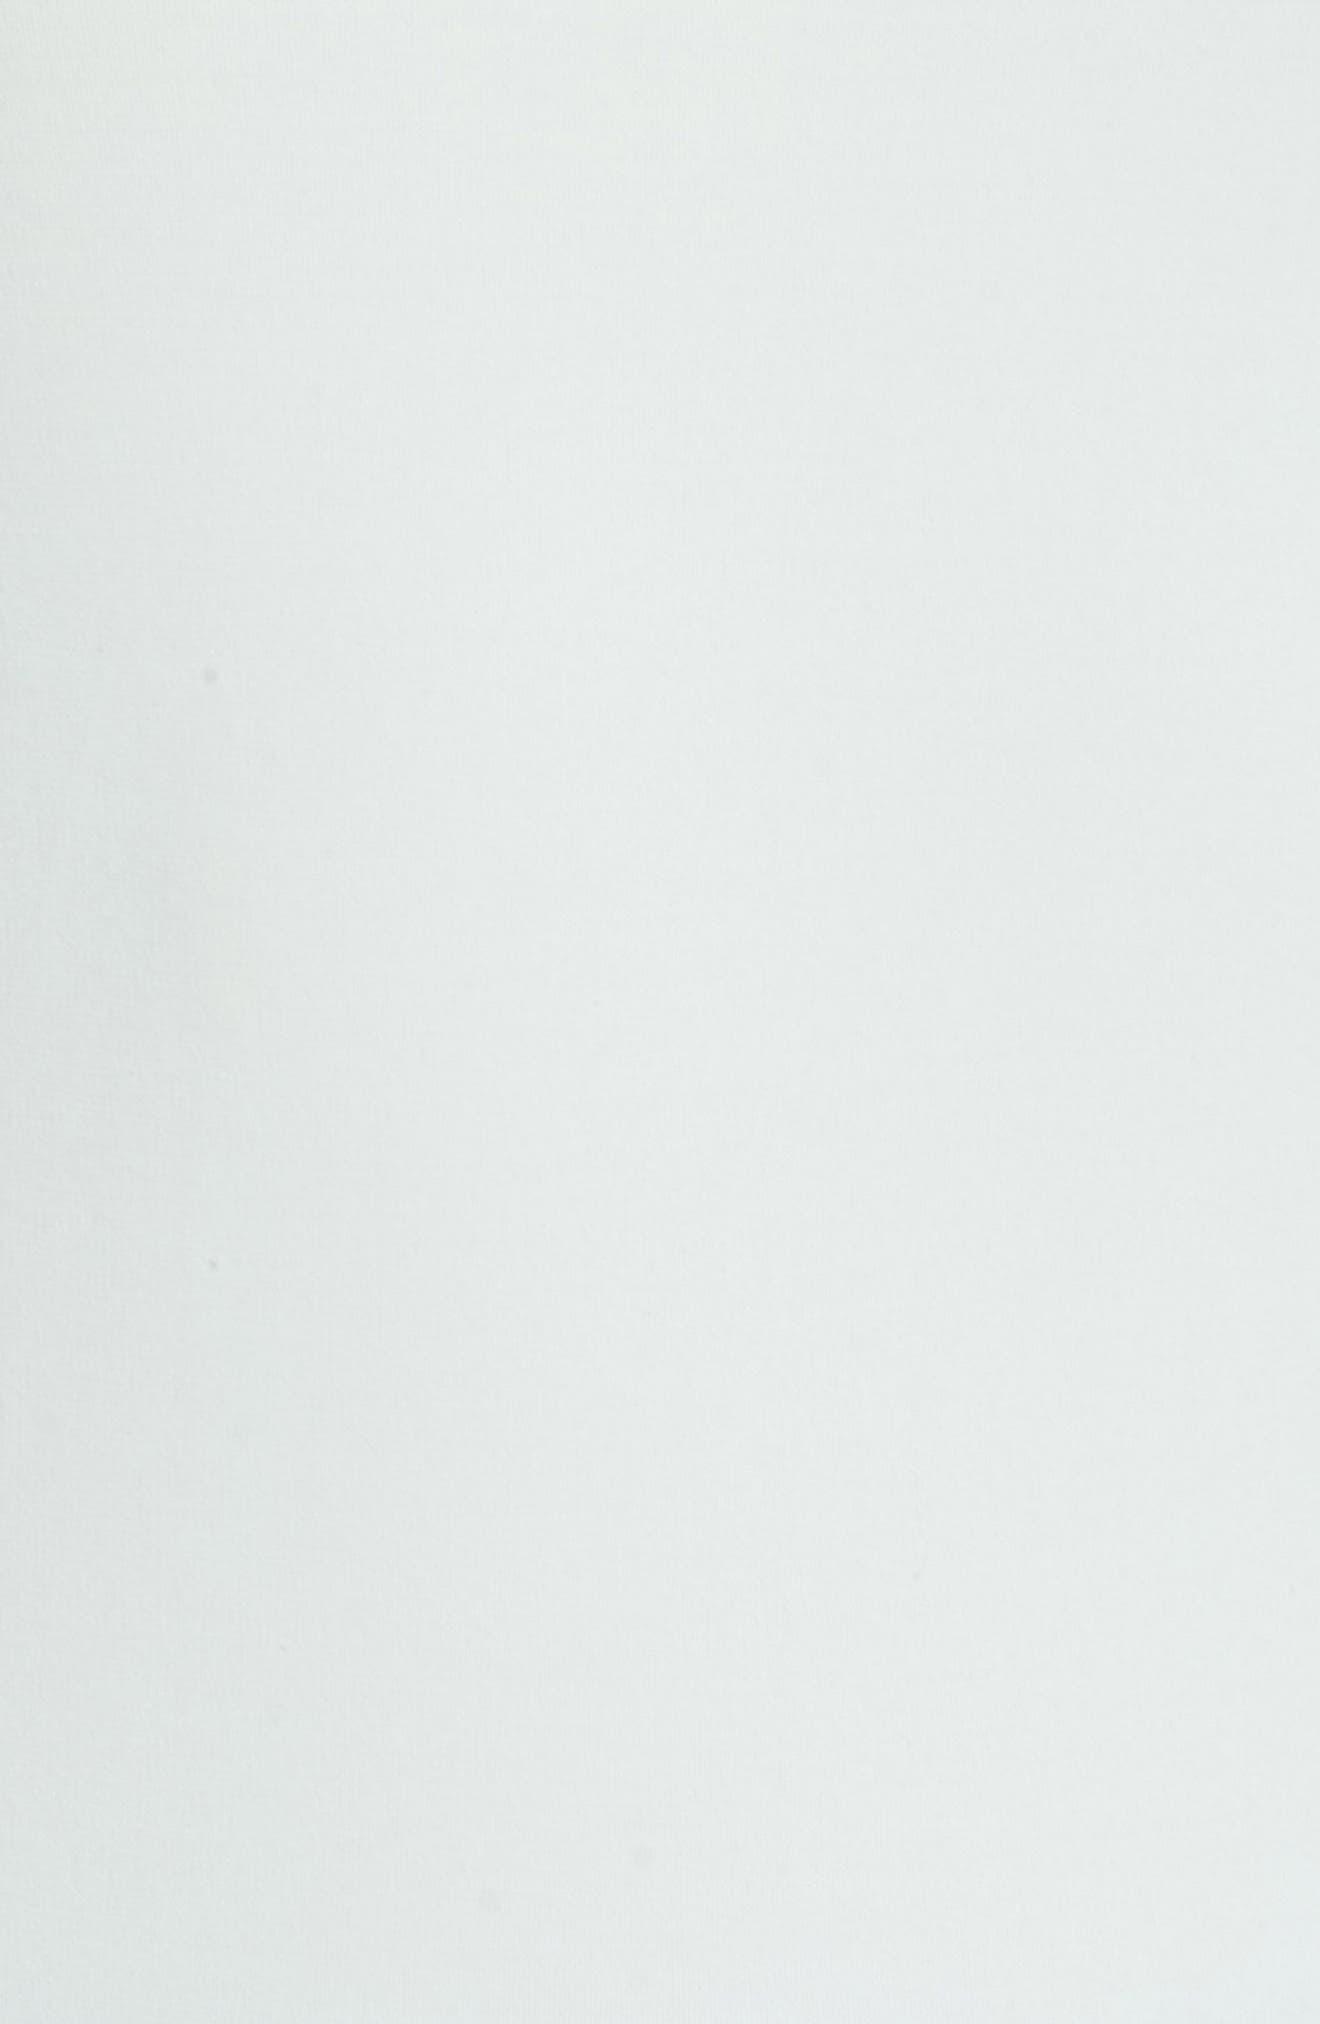 NikeLab ACG Long Sleeve Women's Top,                             Alternate thumbnail 6, color,                             Barely Green/ Black